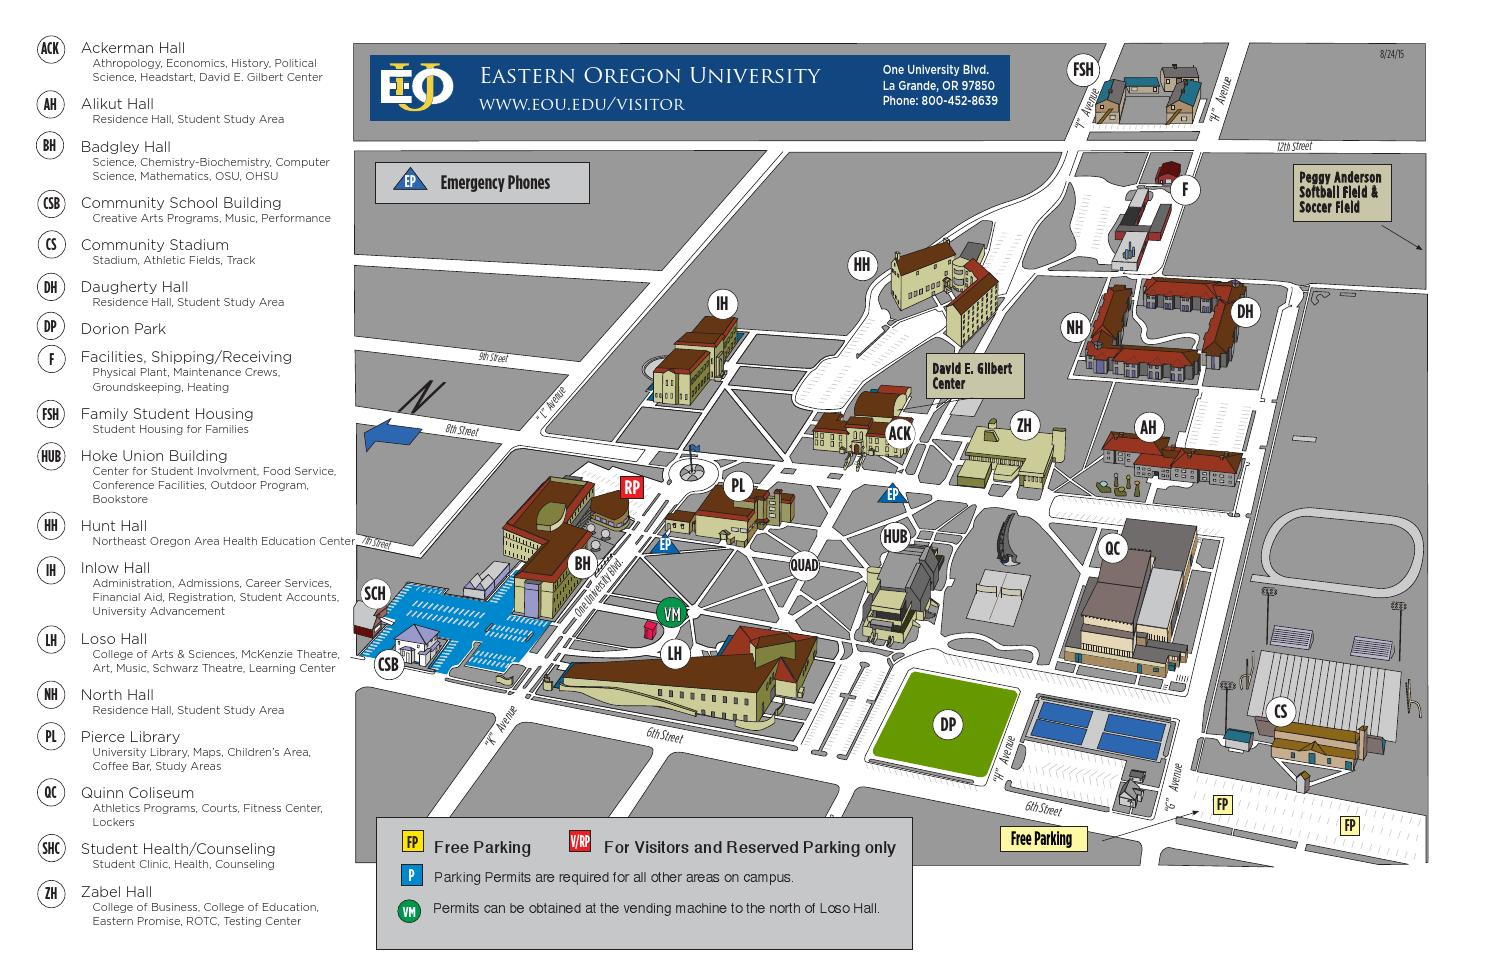 eastern oregon university campus map Eou Campus Map By Le Bailey Issuu eastern oregon university campus map